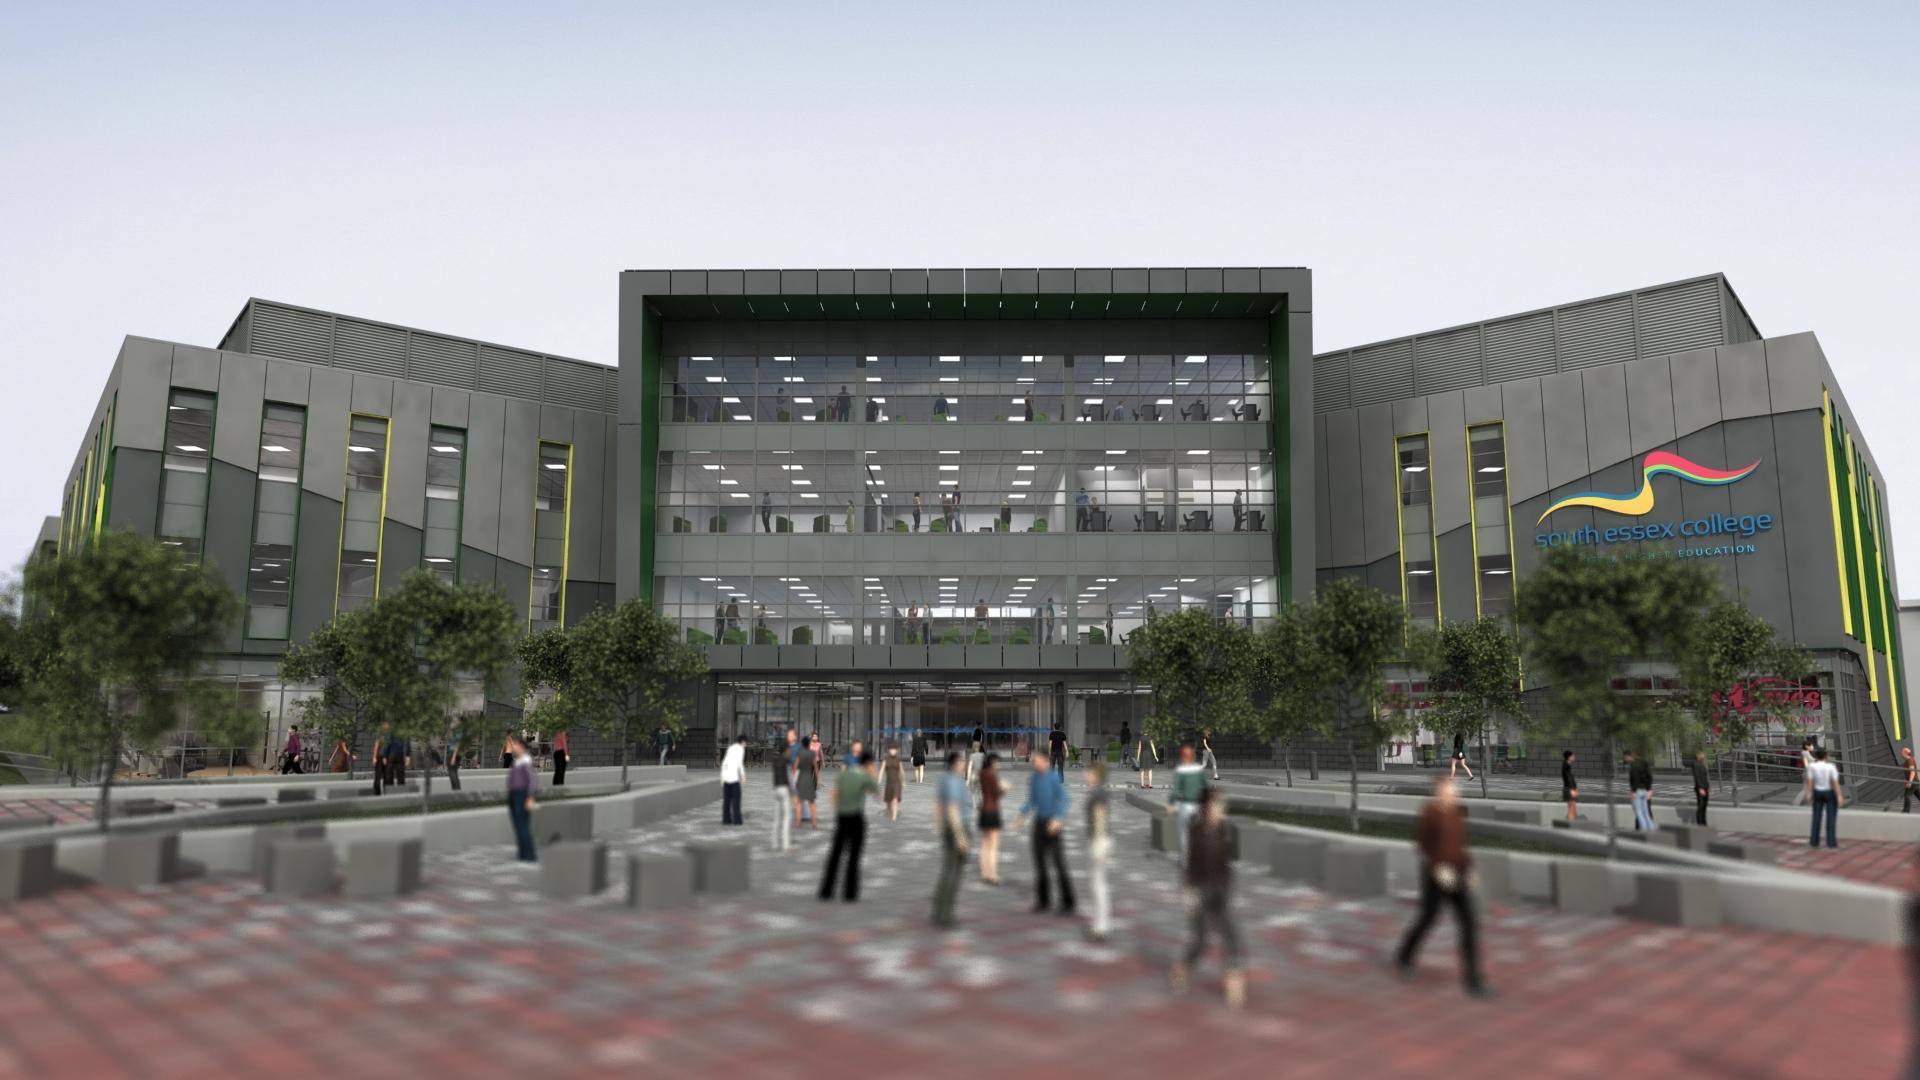 South Essex College Architectural 3D Render-02.jpg